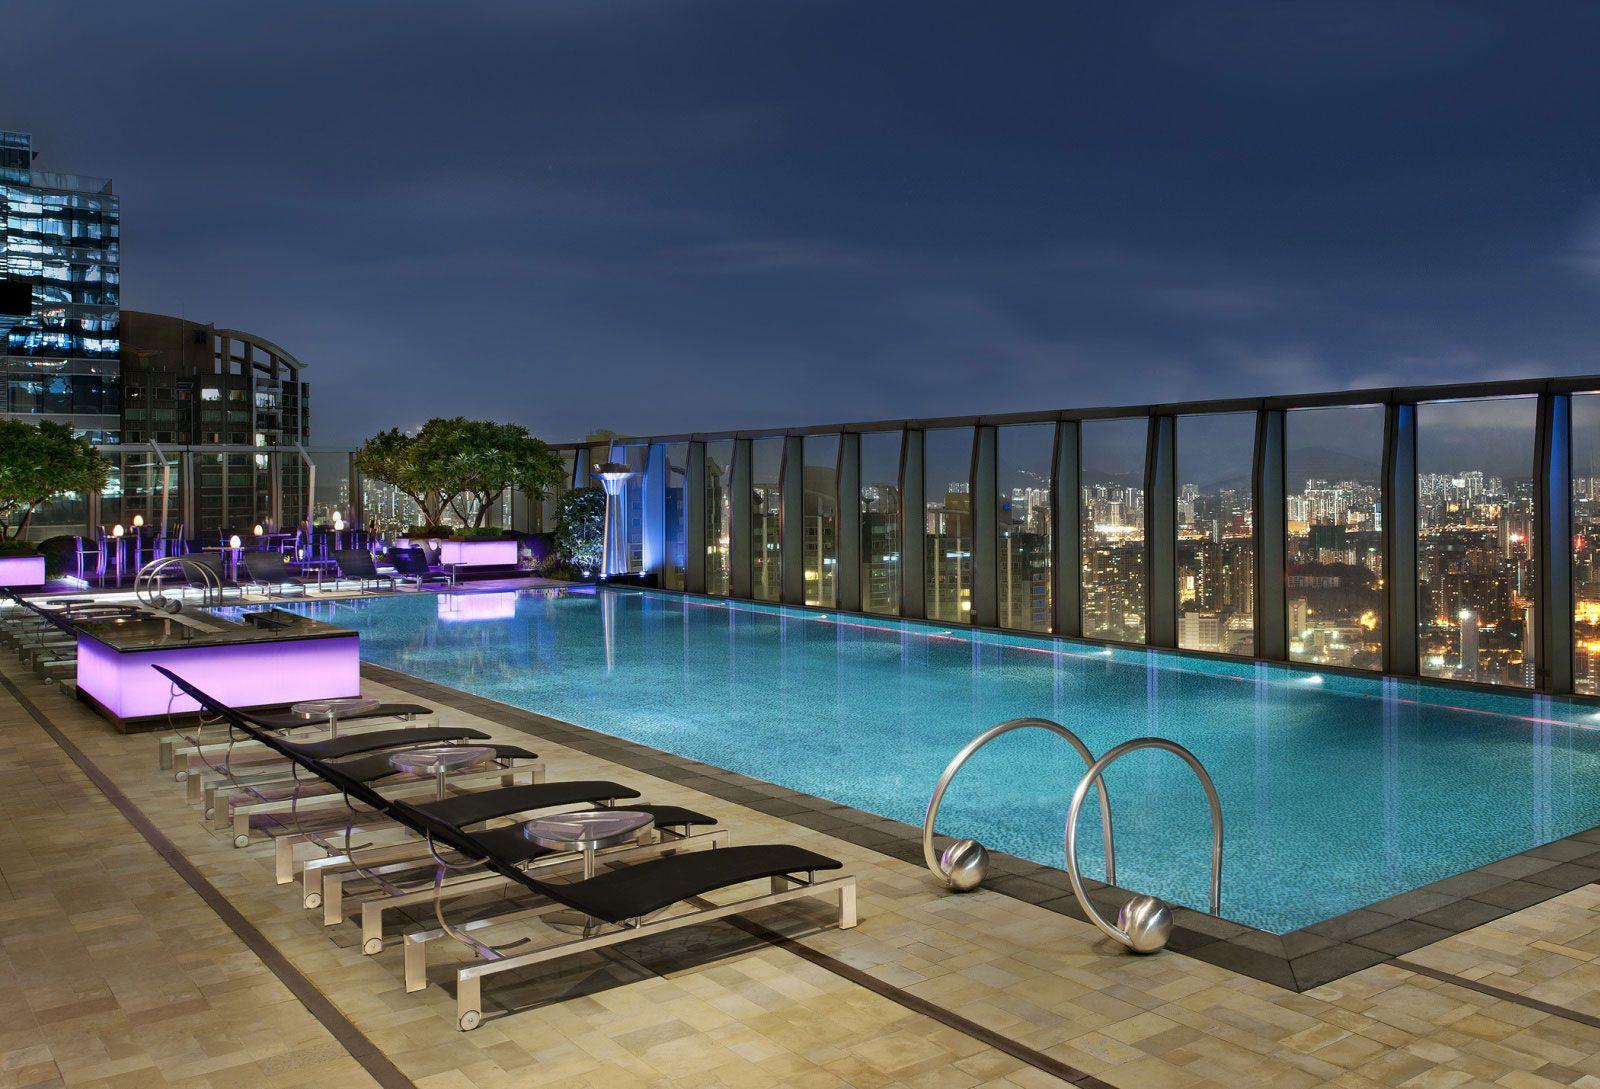 nearest hotel pool aga - 1024×697